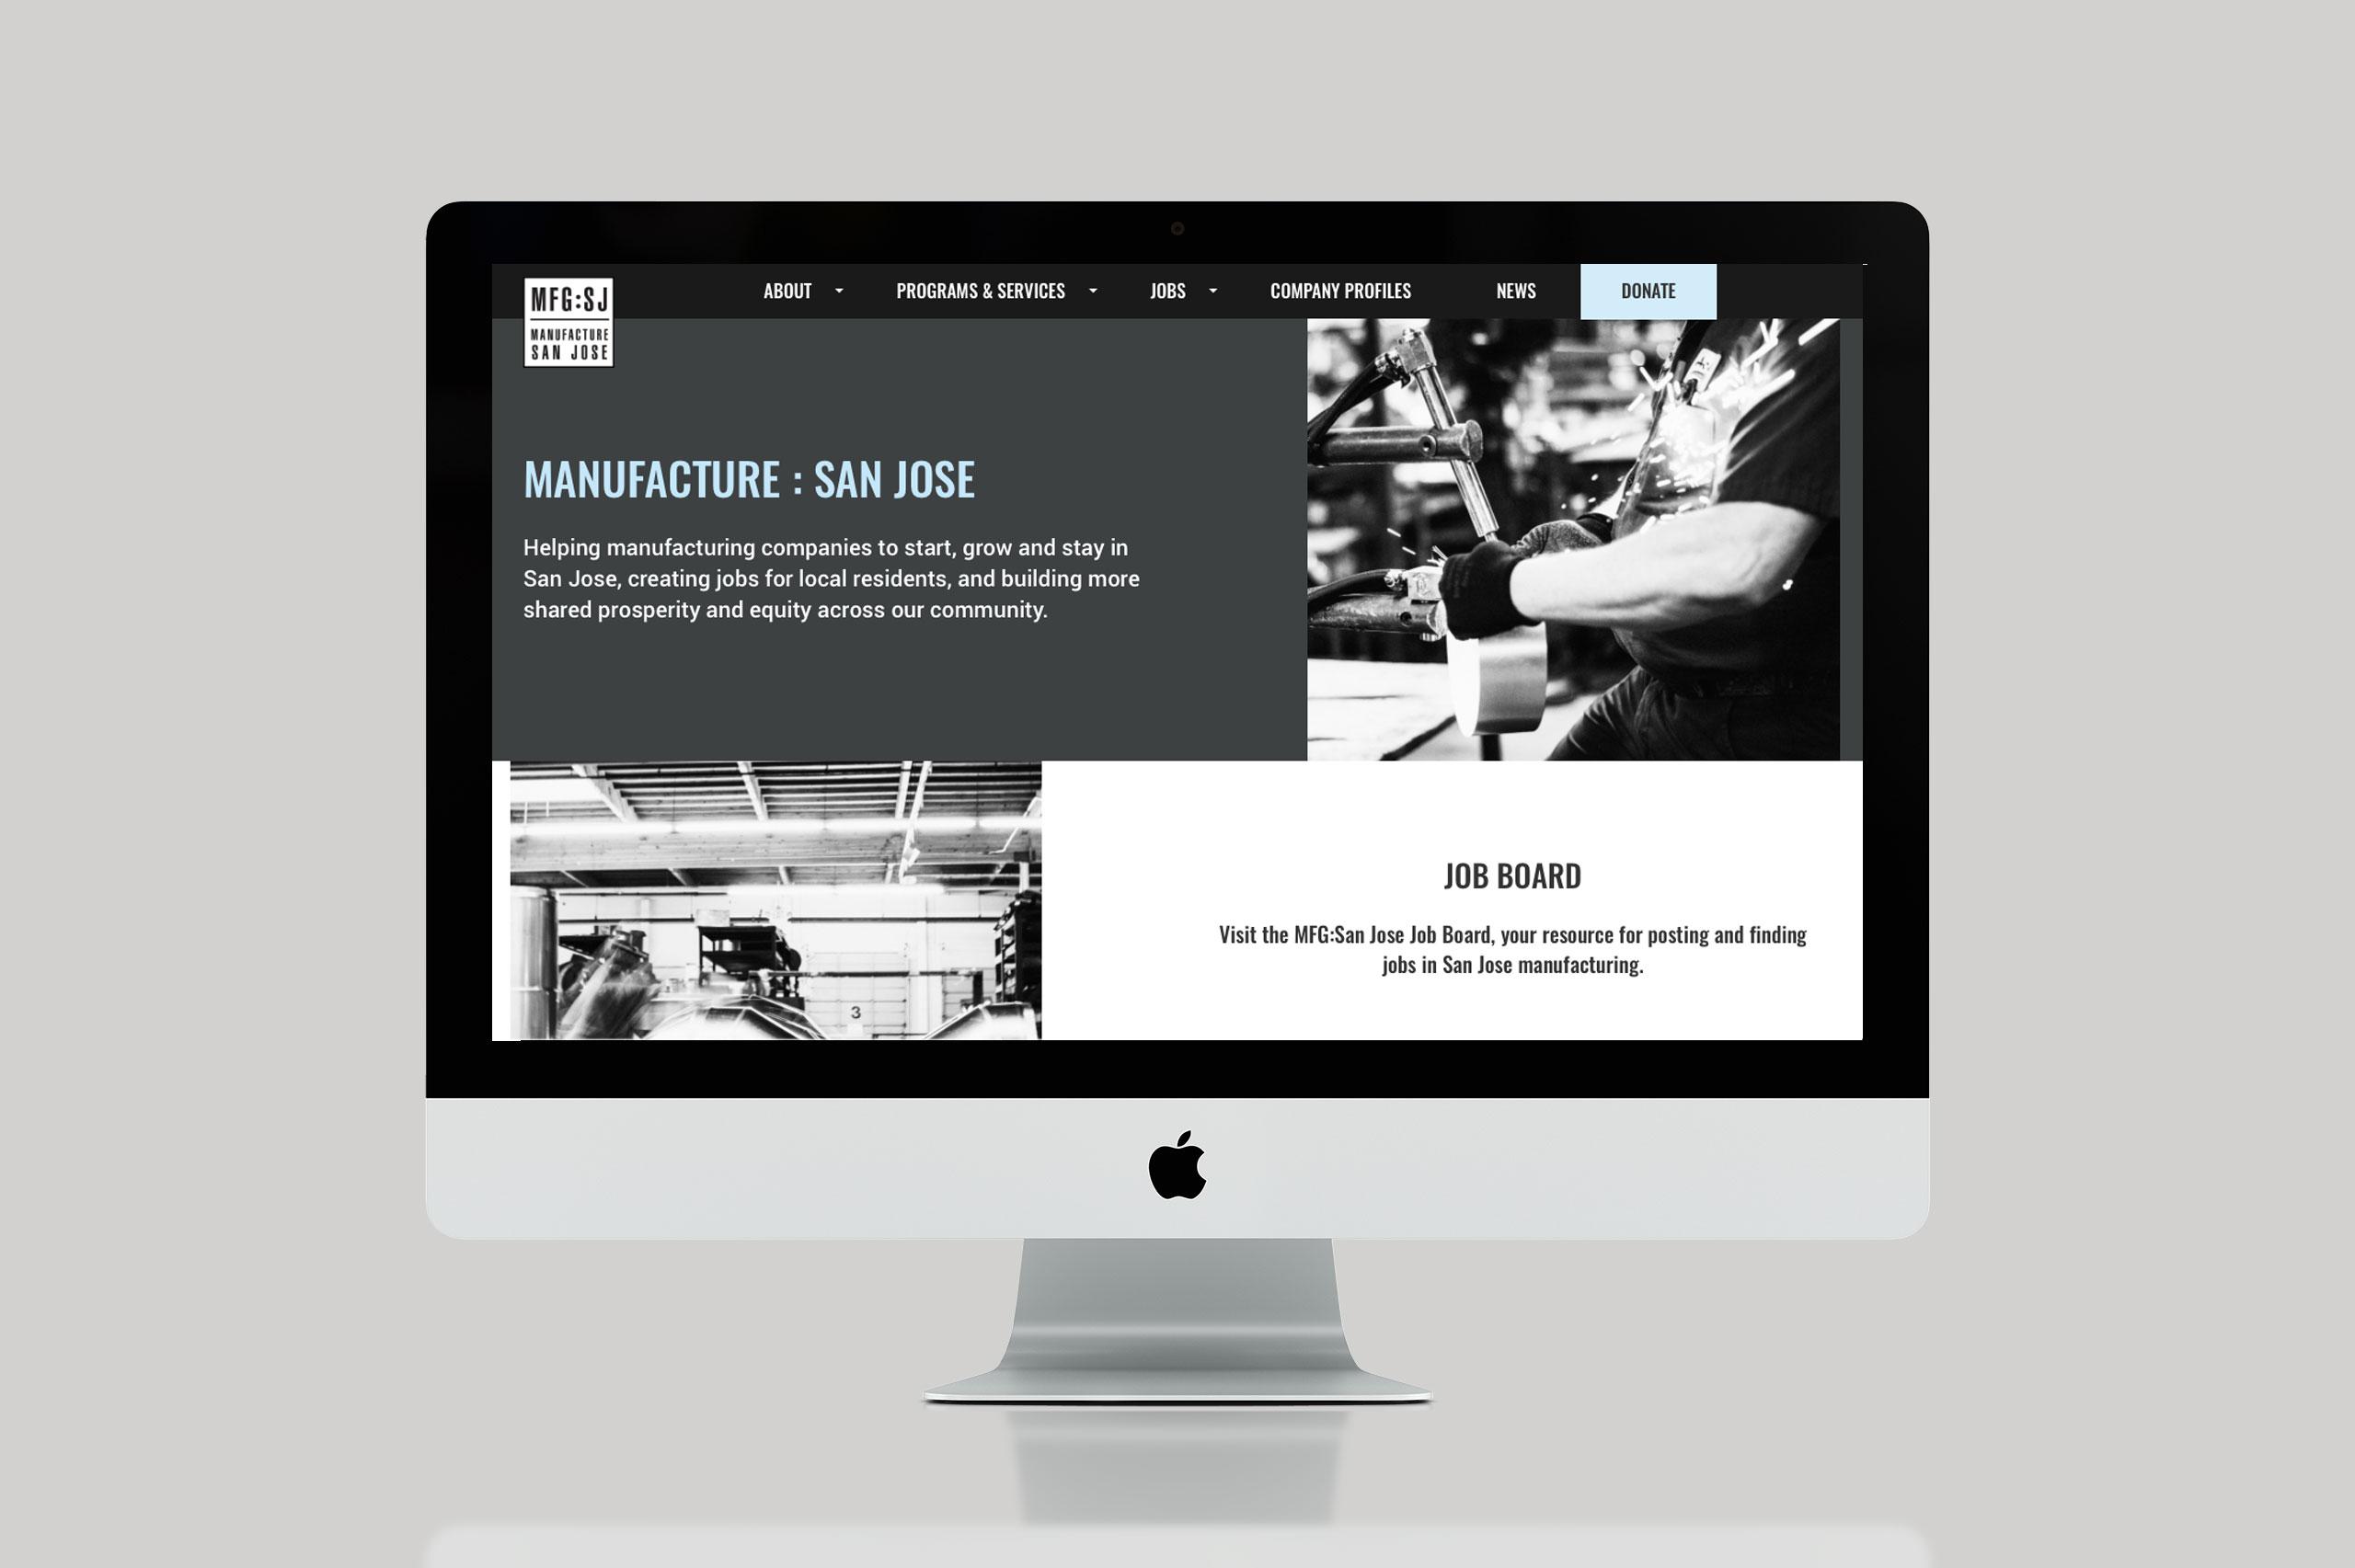 Manufacture San Jose Mfg Sj Arin Fishkin Graphic Design